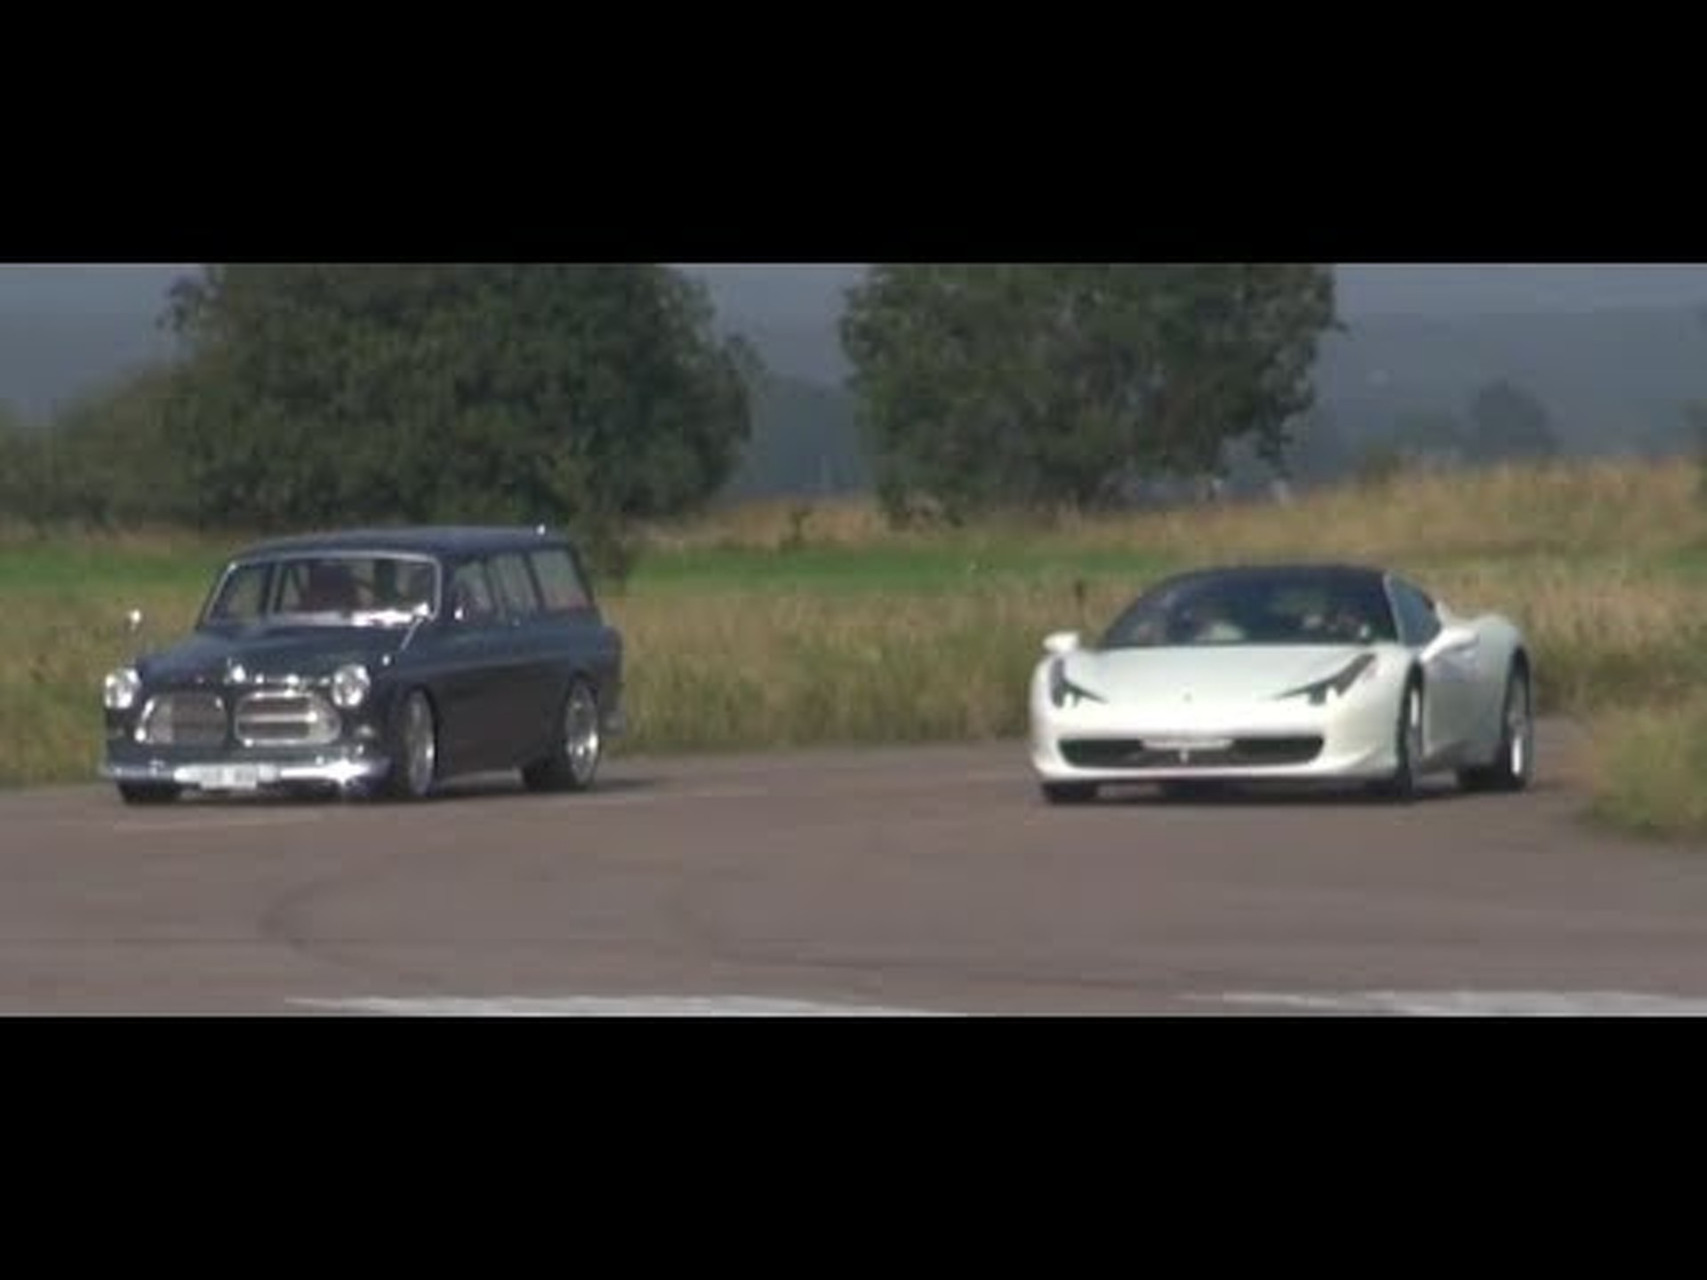 Ferrari 458 vs Volvo Amazon '67